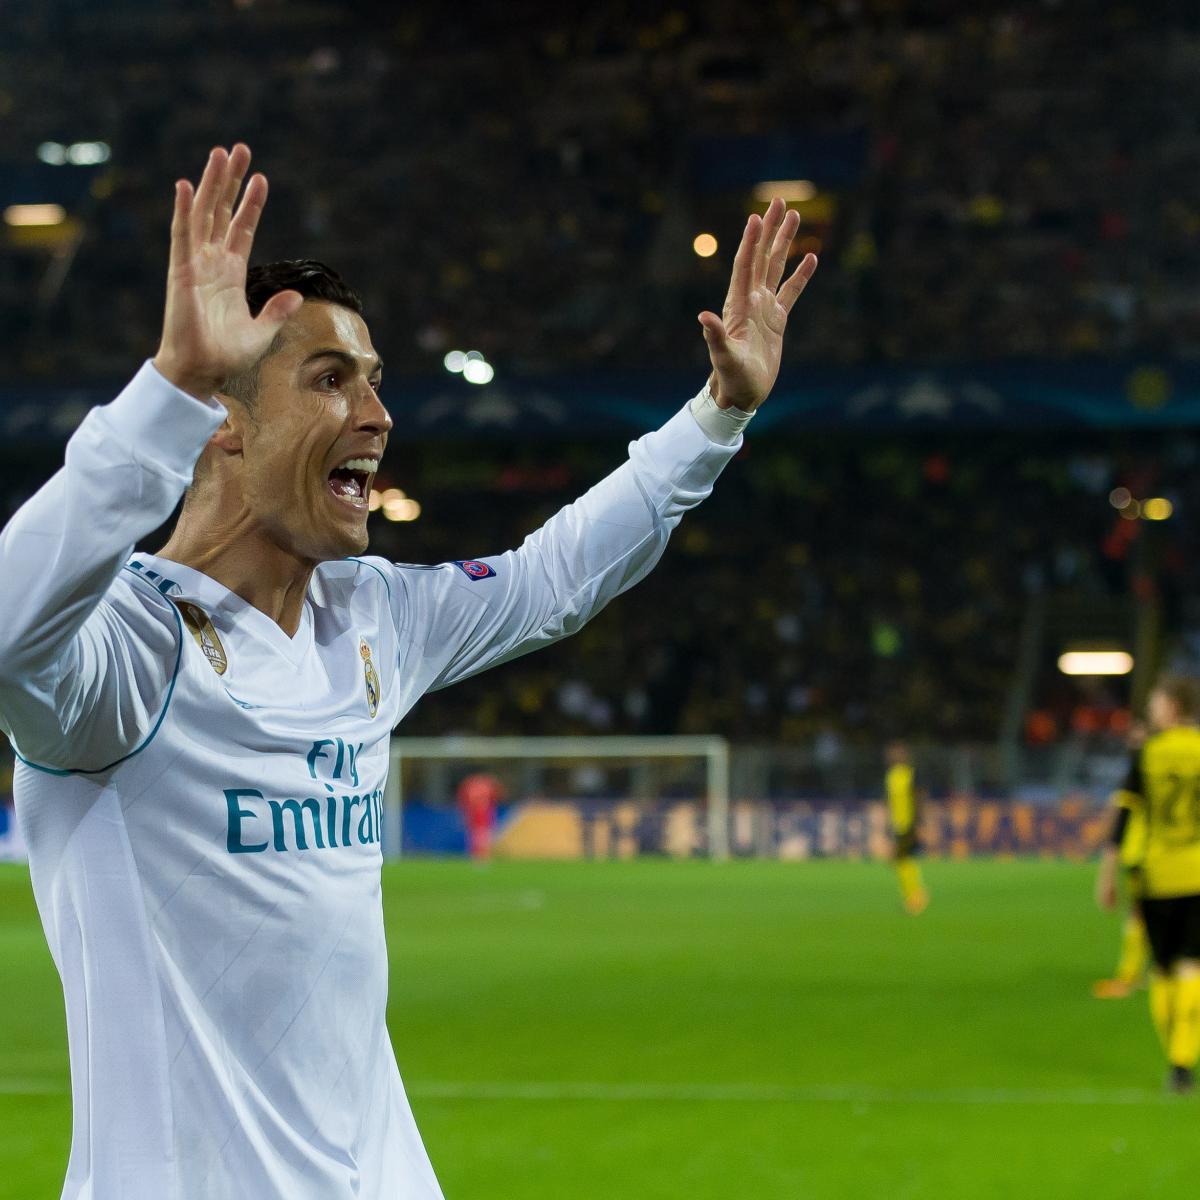 Cristiano Ronaldo S 4 Goals Lead Real Madrid To Win Vs: Cristiano Ronaldo Jokes Lionel Messi Is 'Bad' Before Real